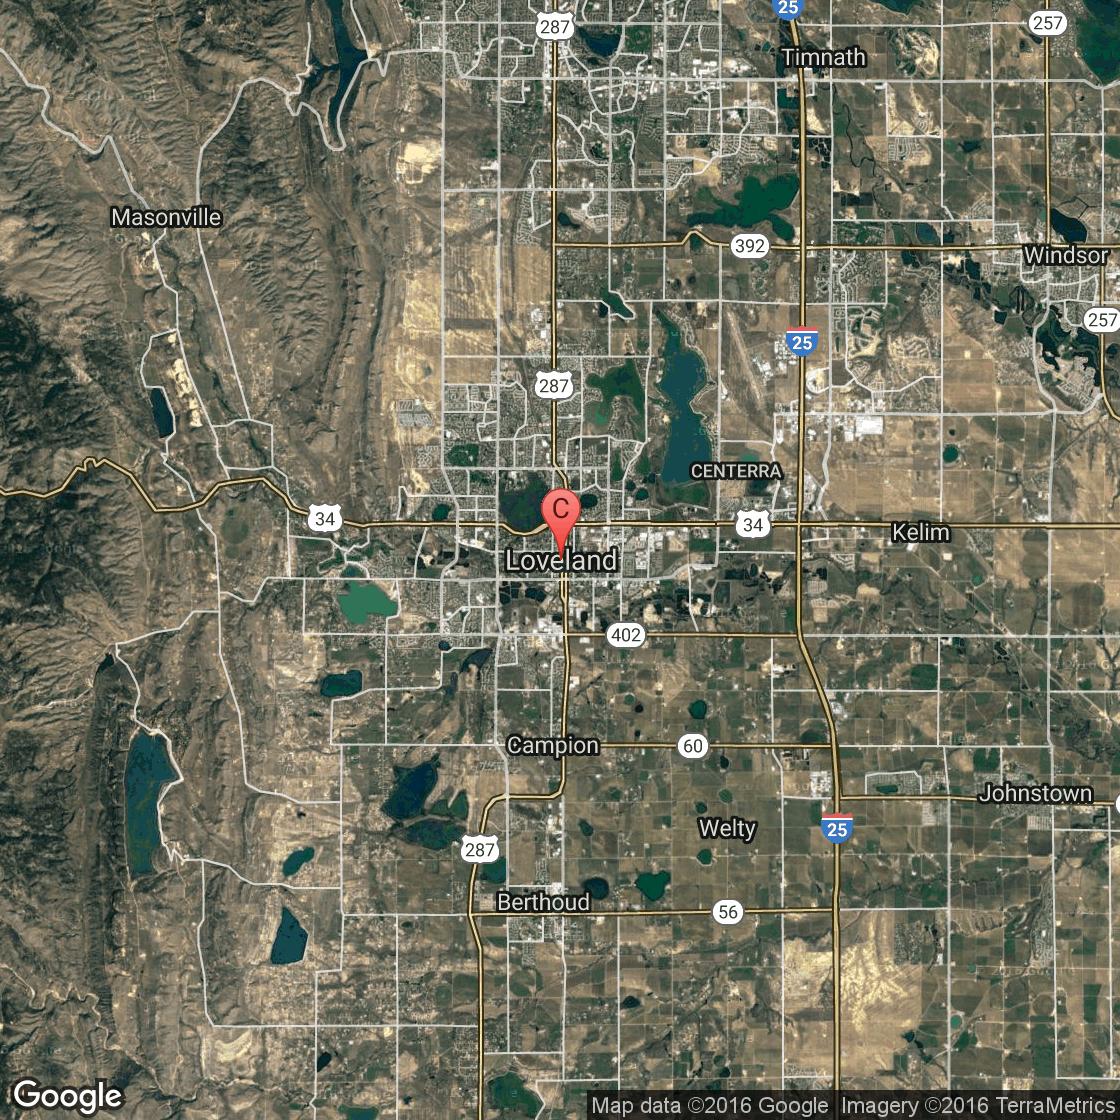 hotels near thunder mountain harley-davidson in loveland, colorado